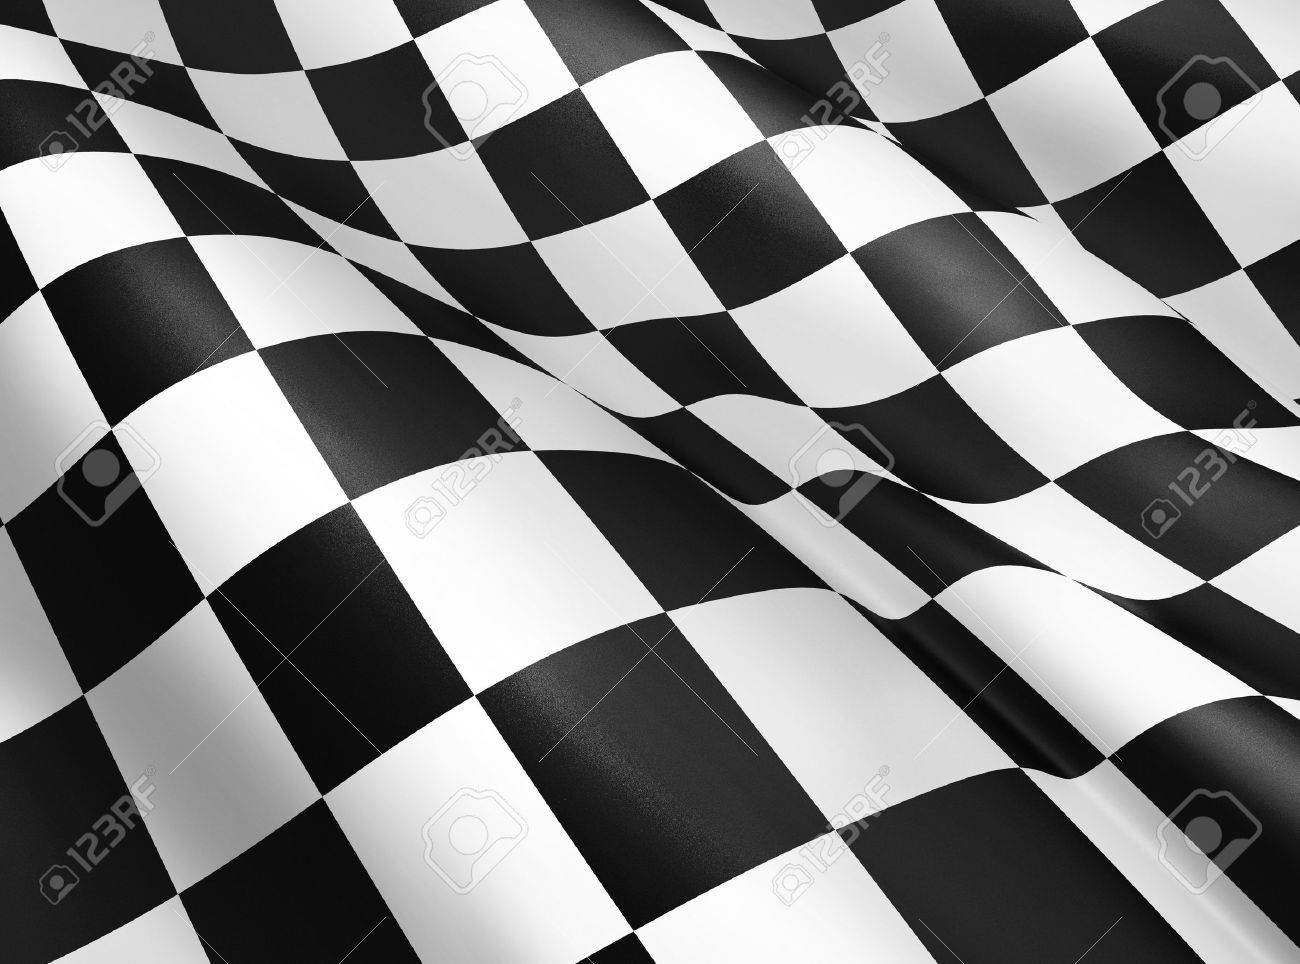 black and white checkered flag background start and finish flag